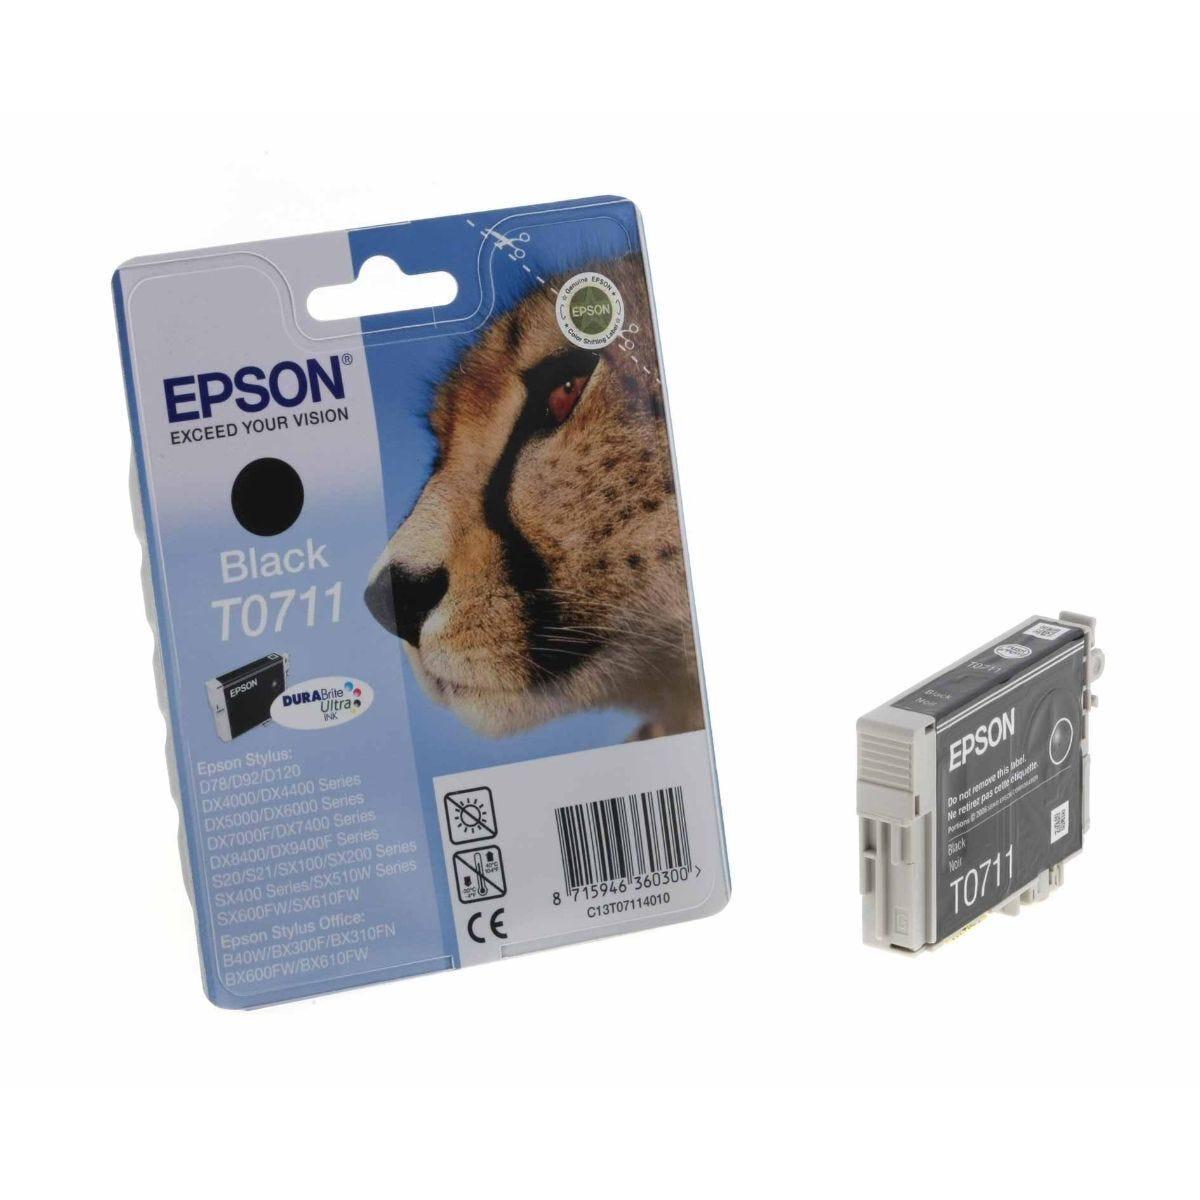 Epson T0711 Ink Cartridge 5.5ml